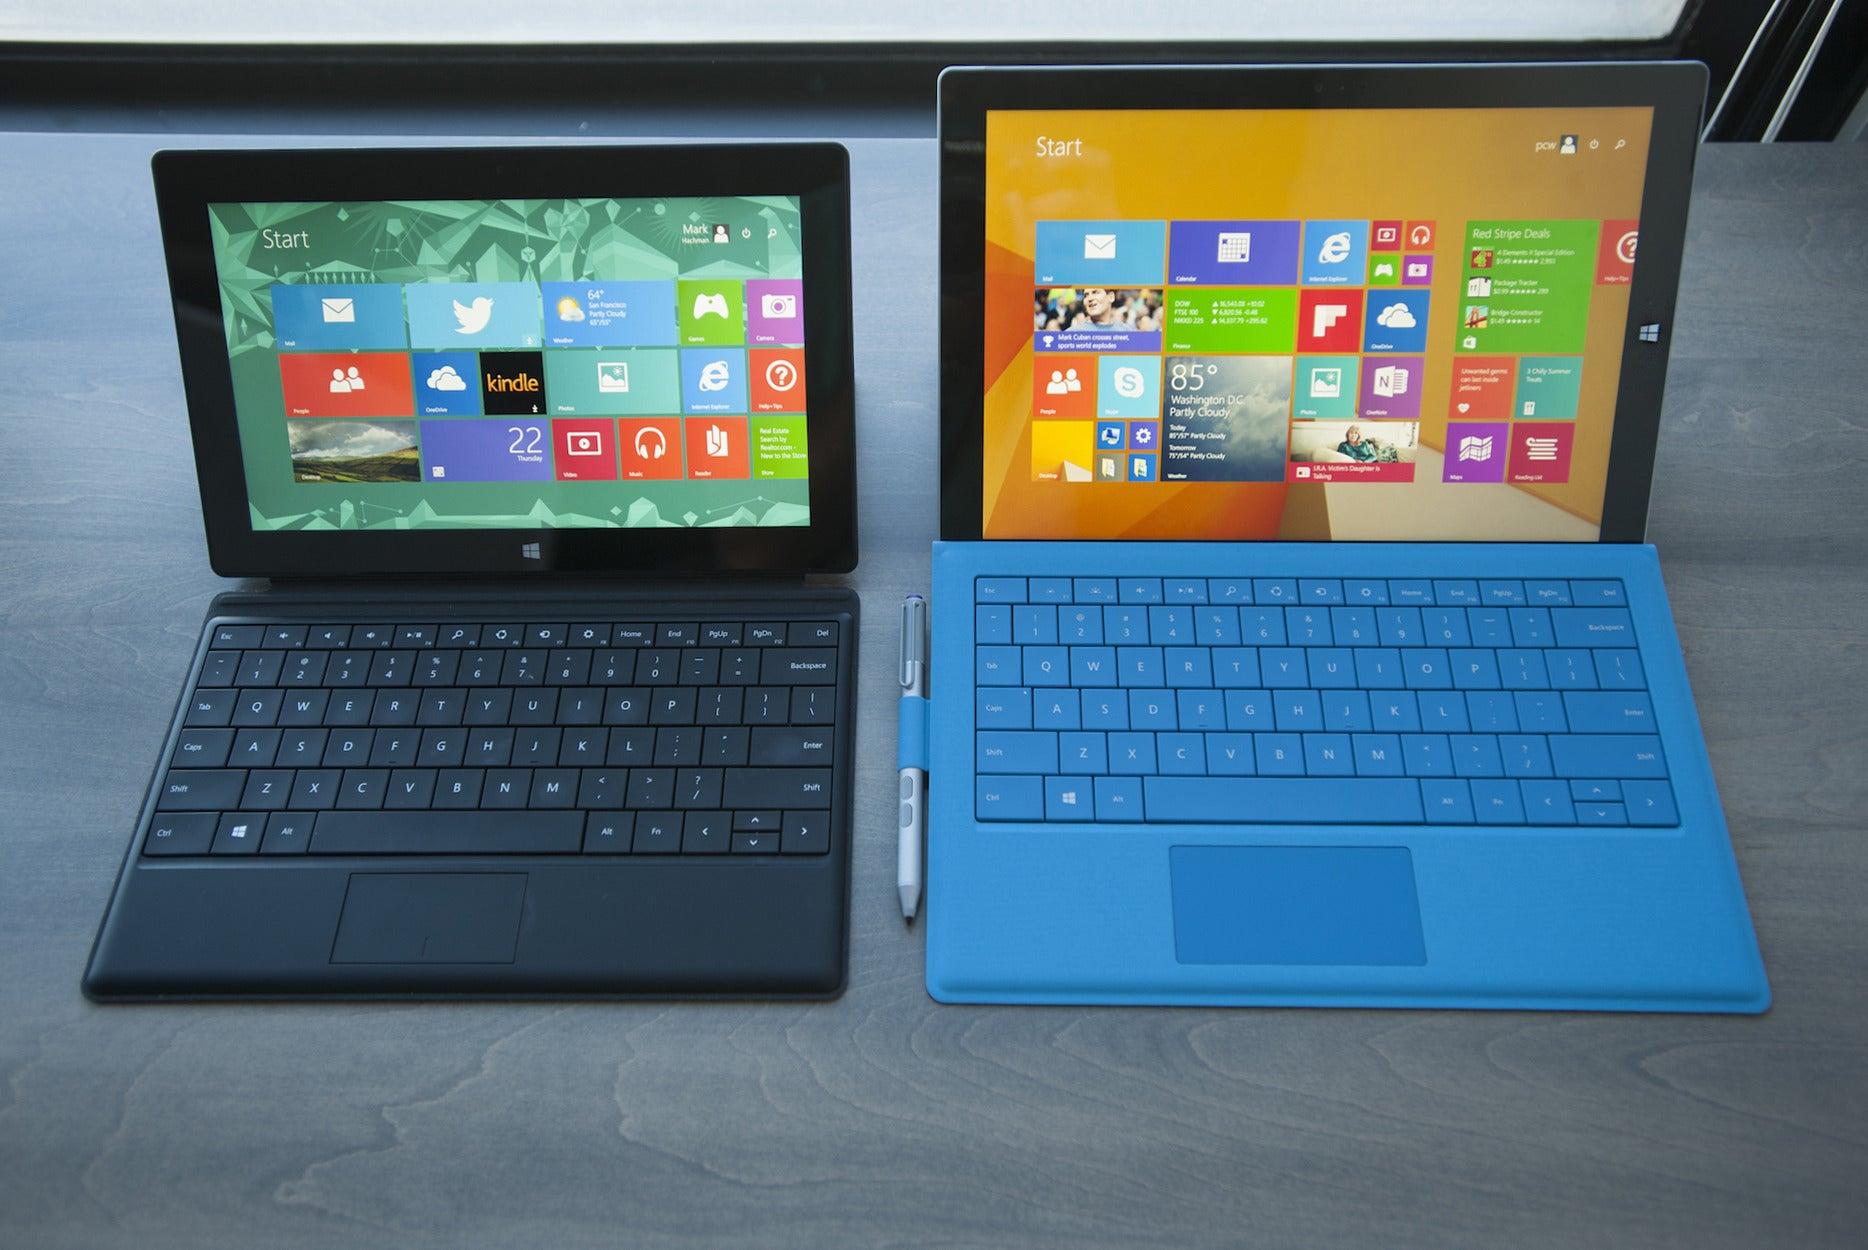 Microsoft surface pro 3 reviews - Microsoft Surface Pro 3